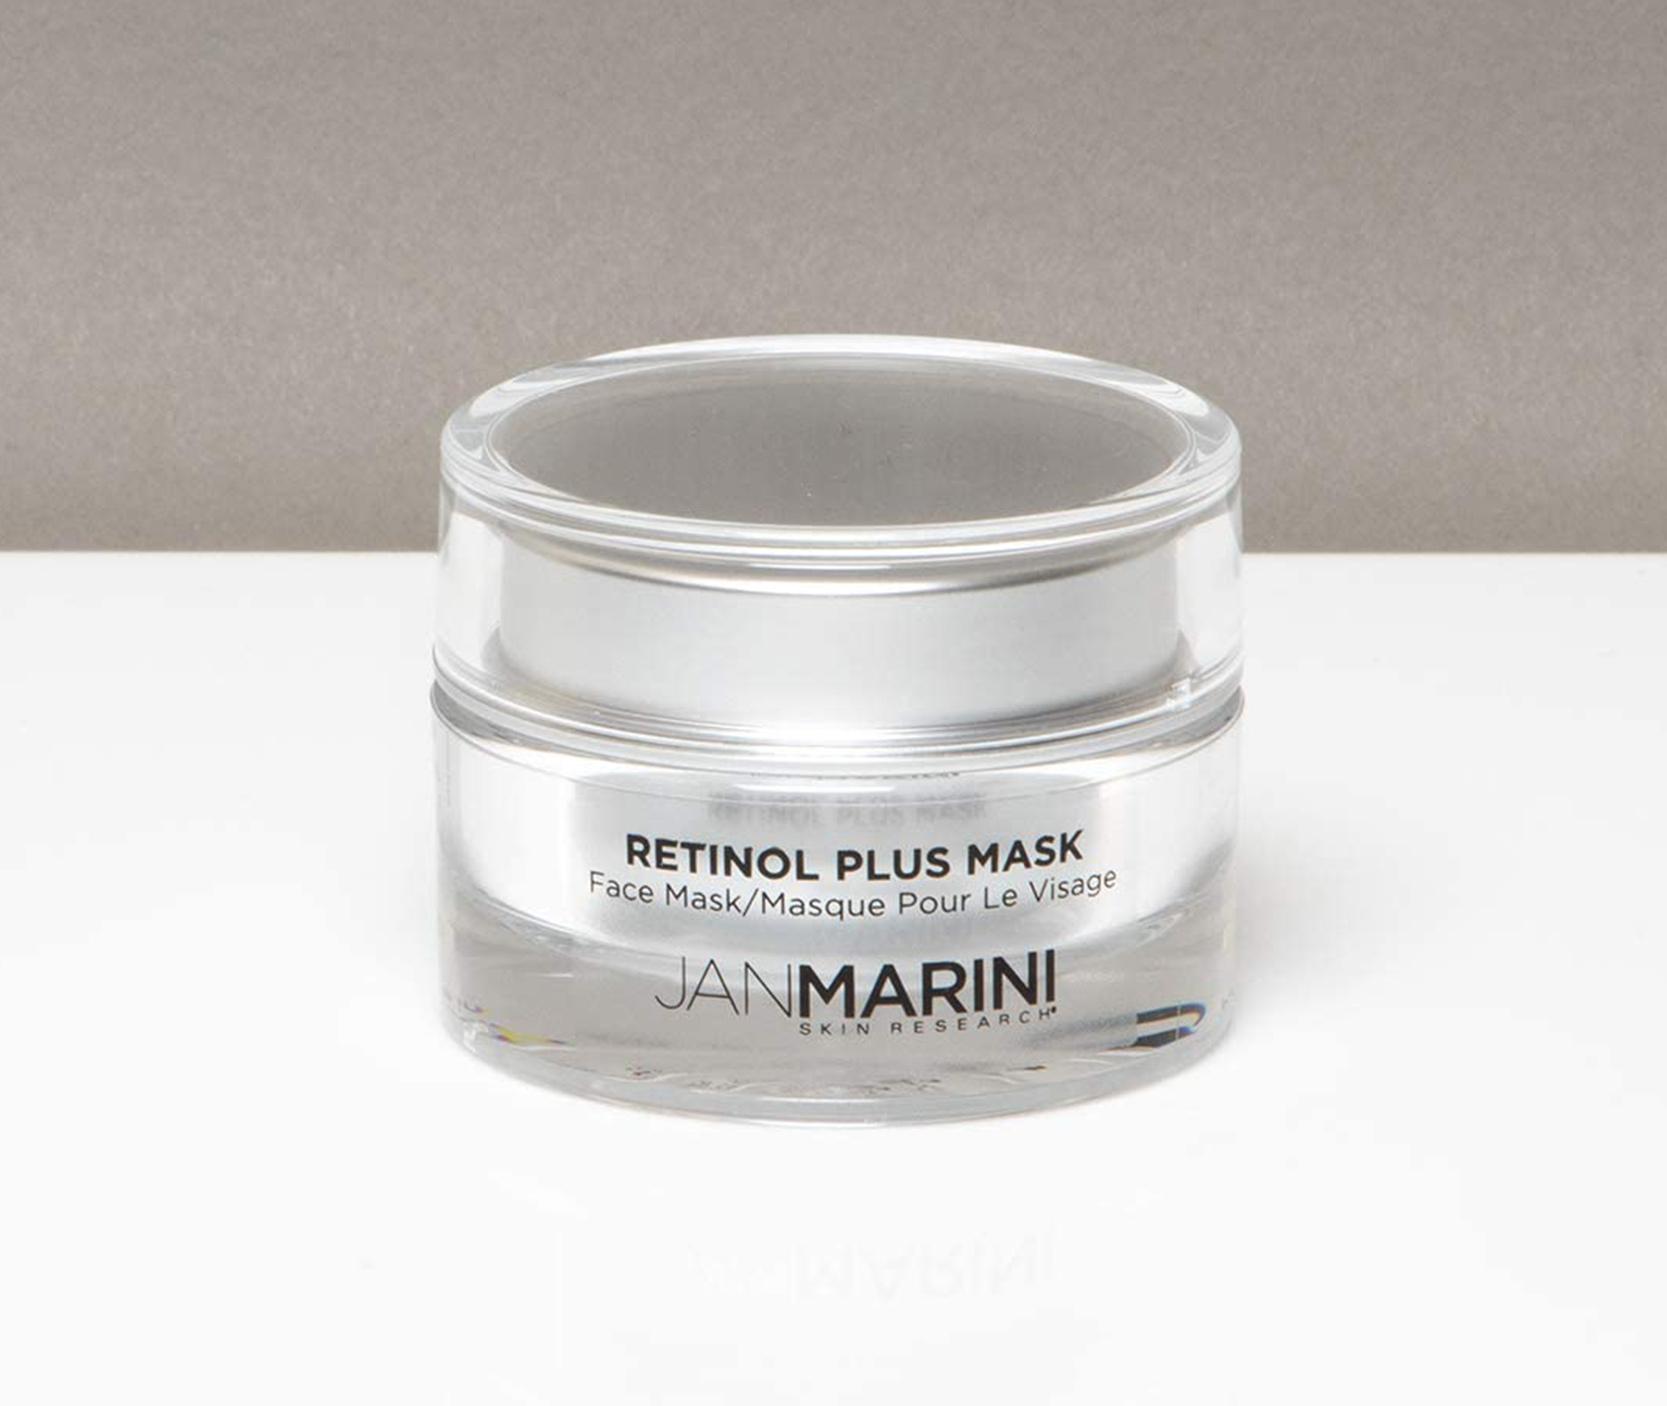 Jan Marini: Retinol Plus Mask